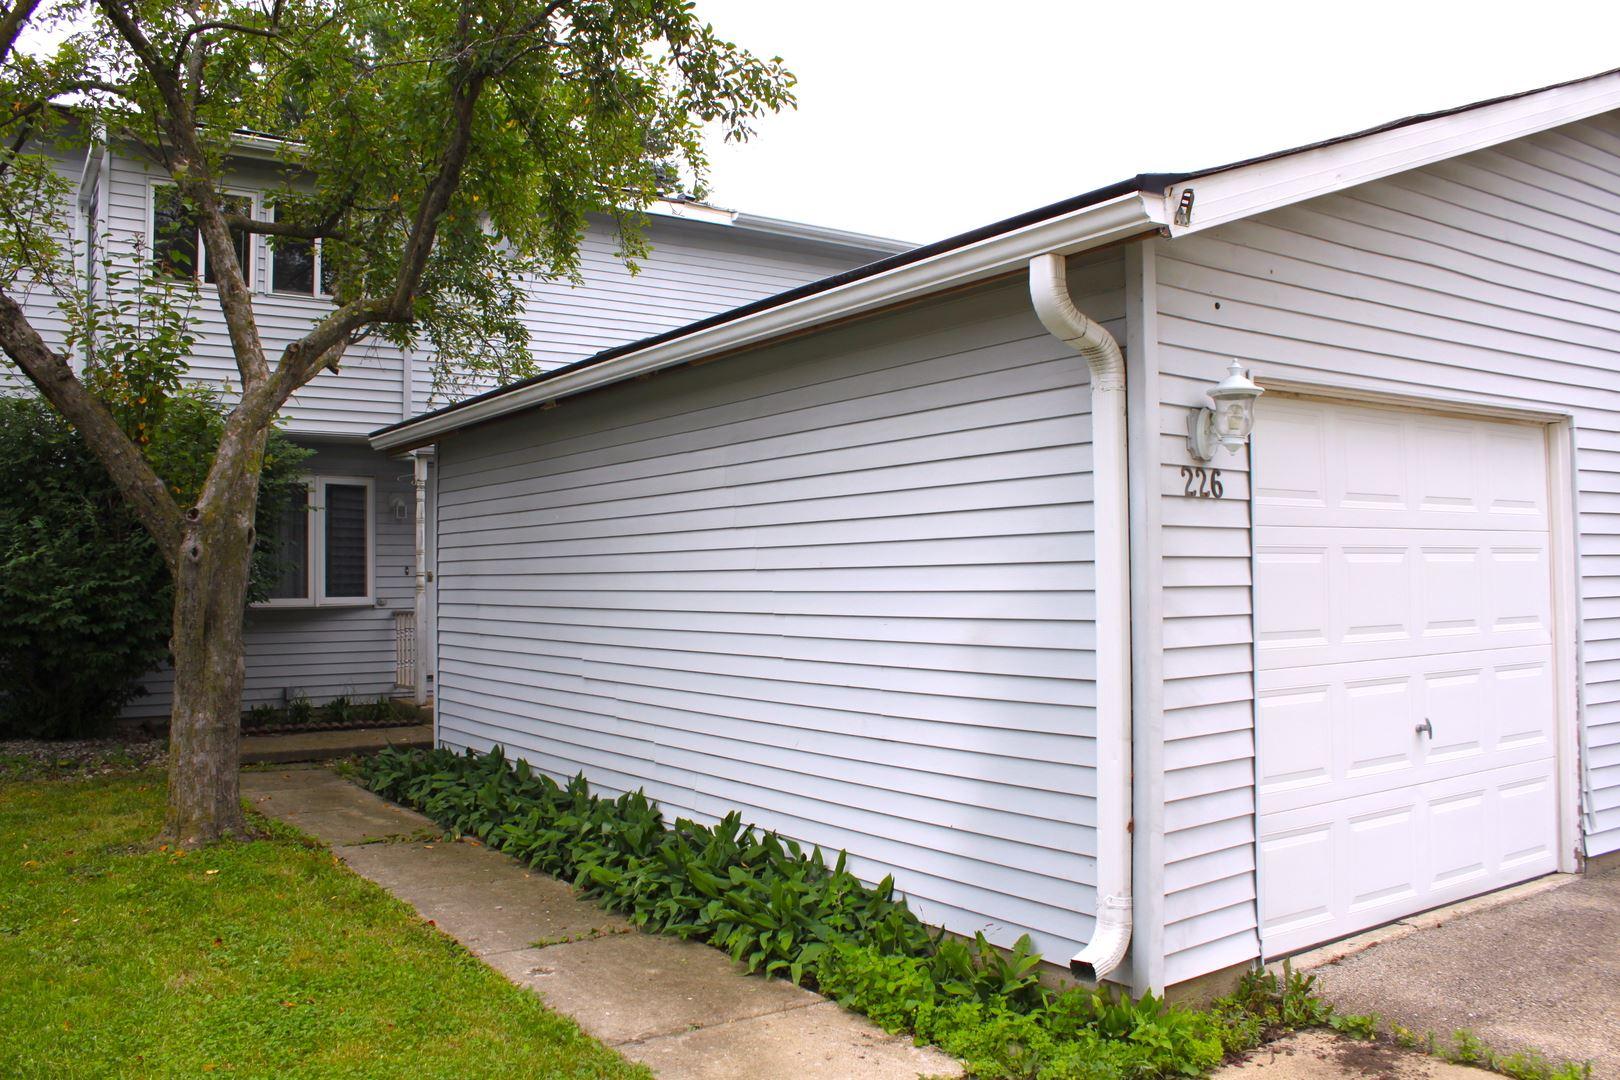 Photo of 226 Karen Circle, Bolingbrook, IL 60440 (MLS # 11159954)